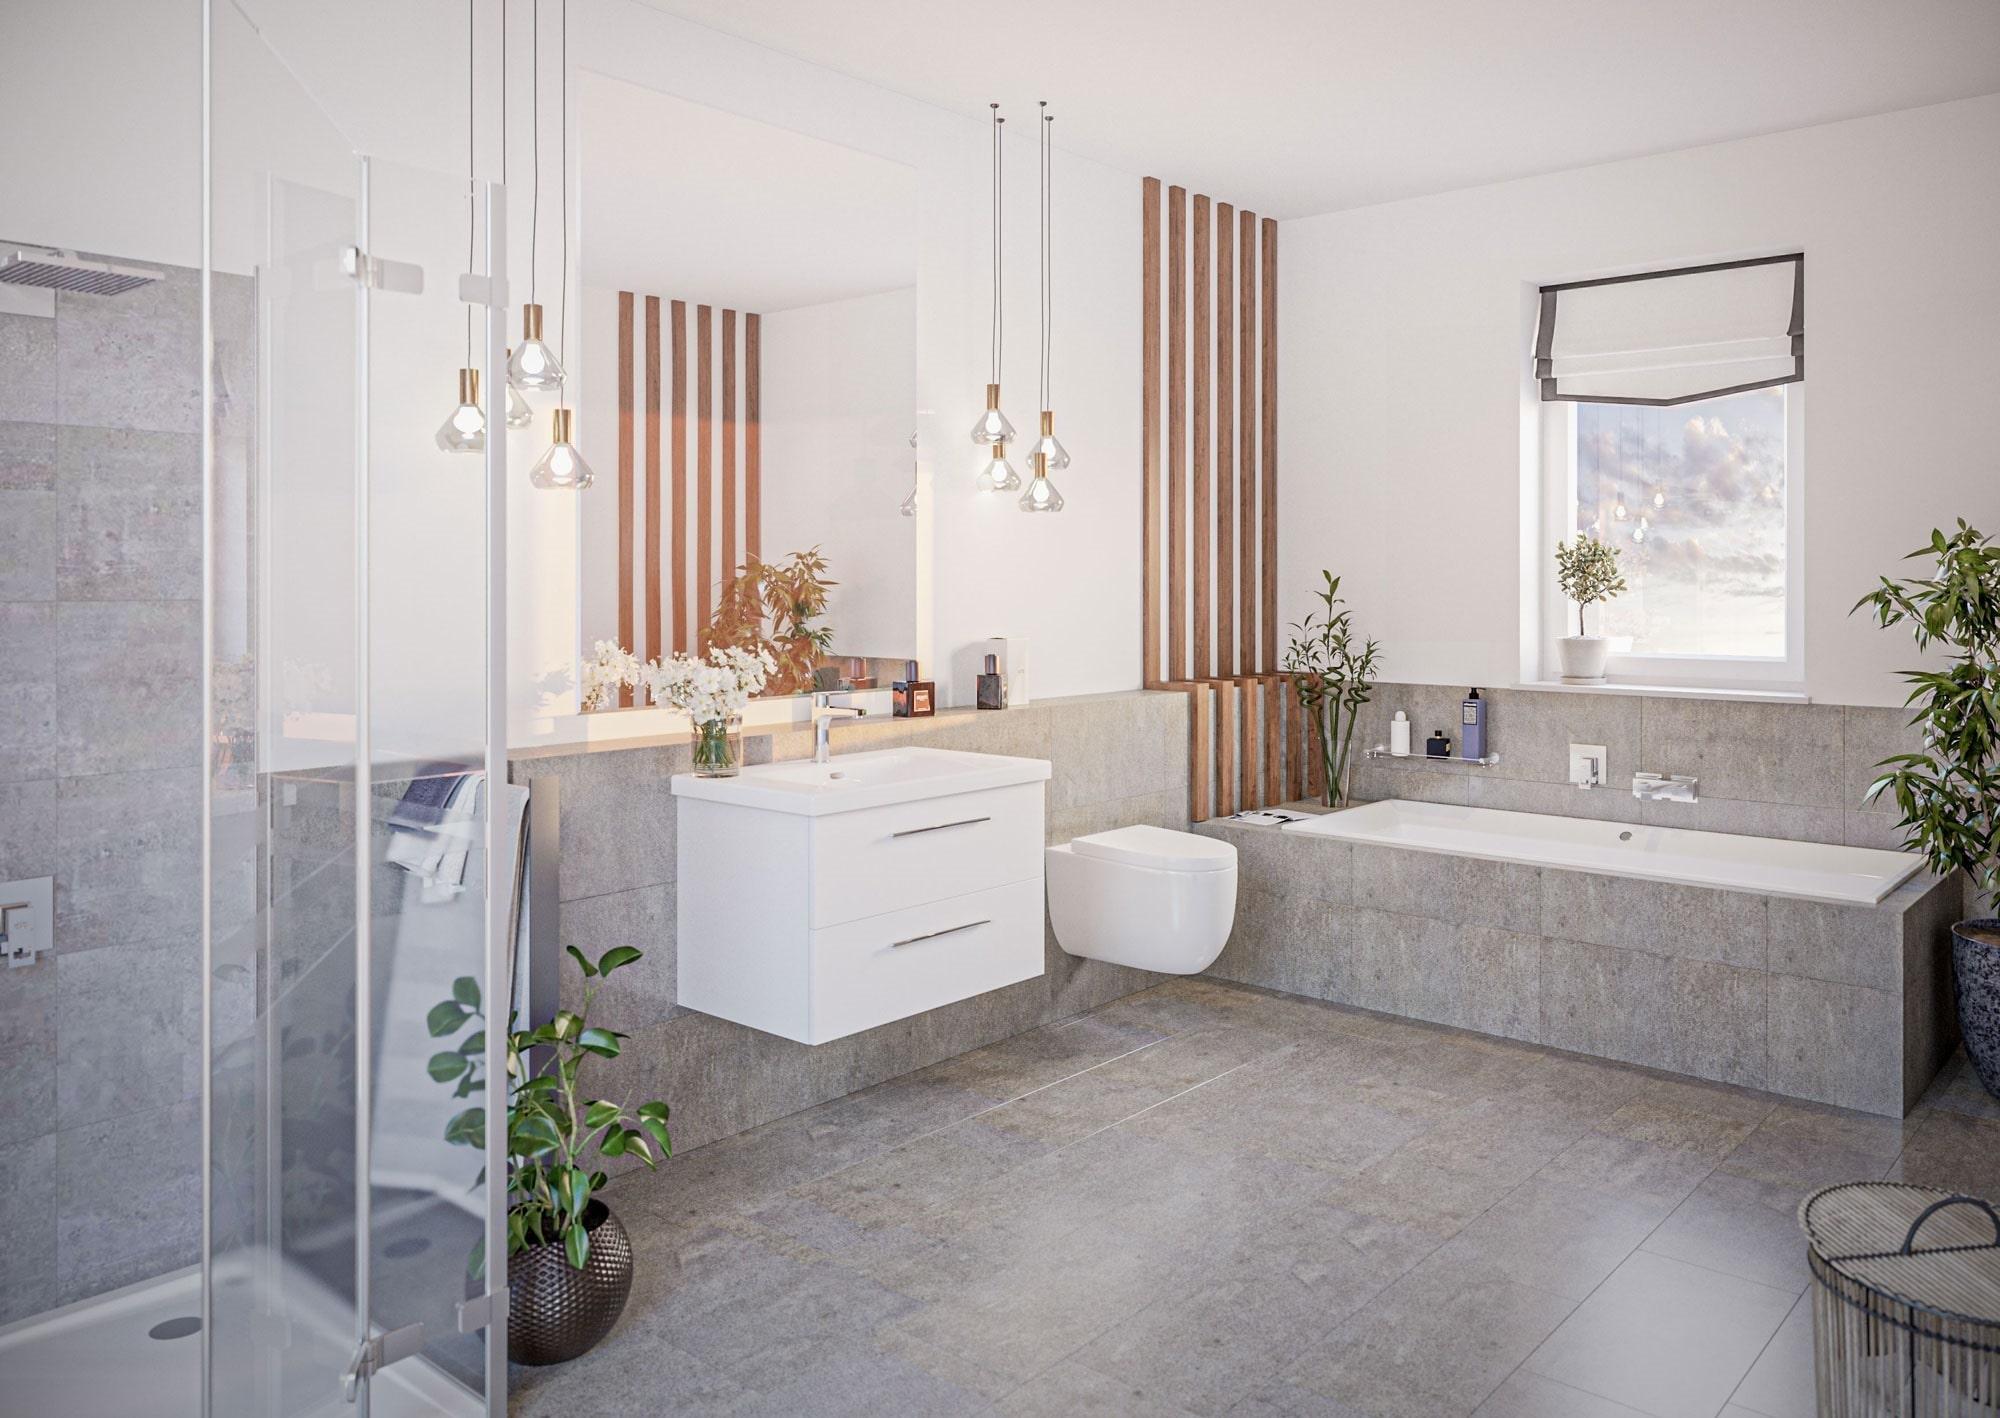 Innenvisualisierung Badezimmer